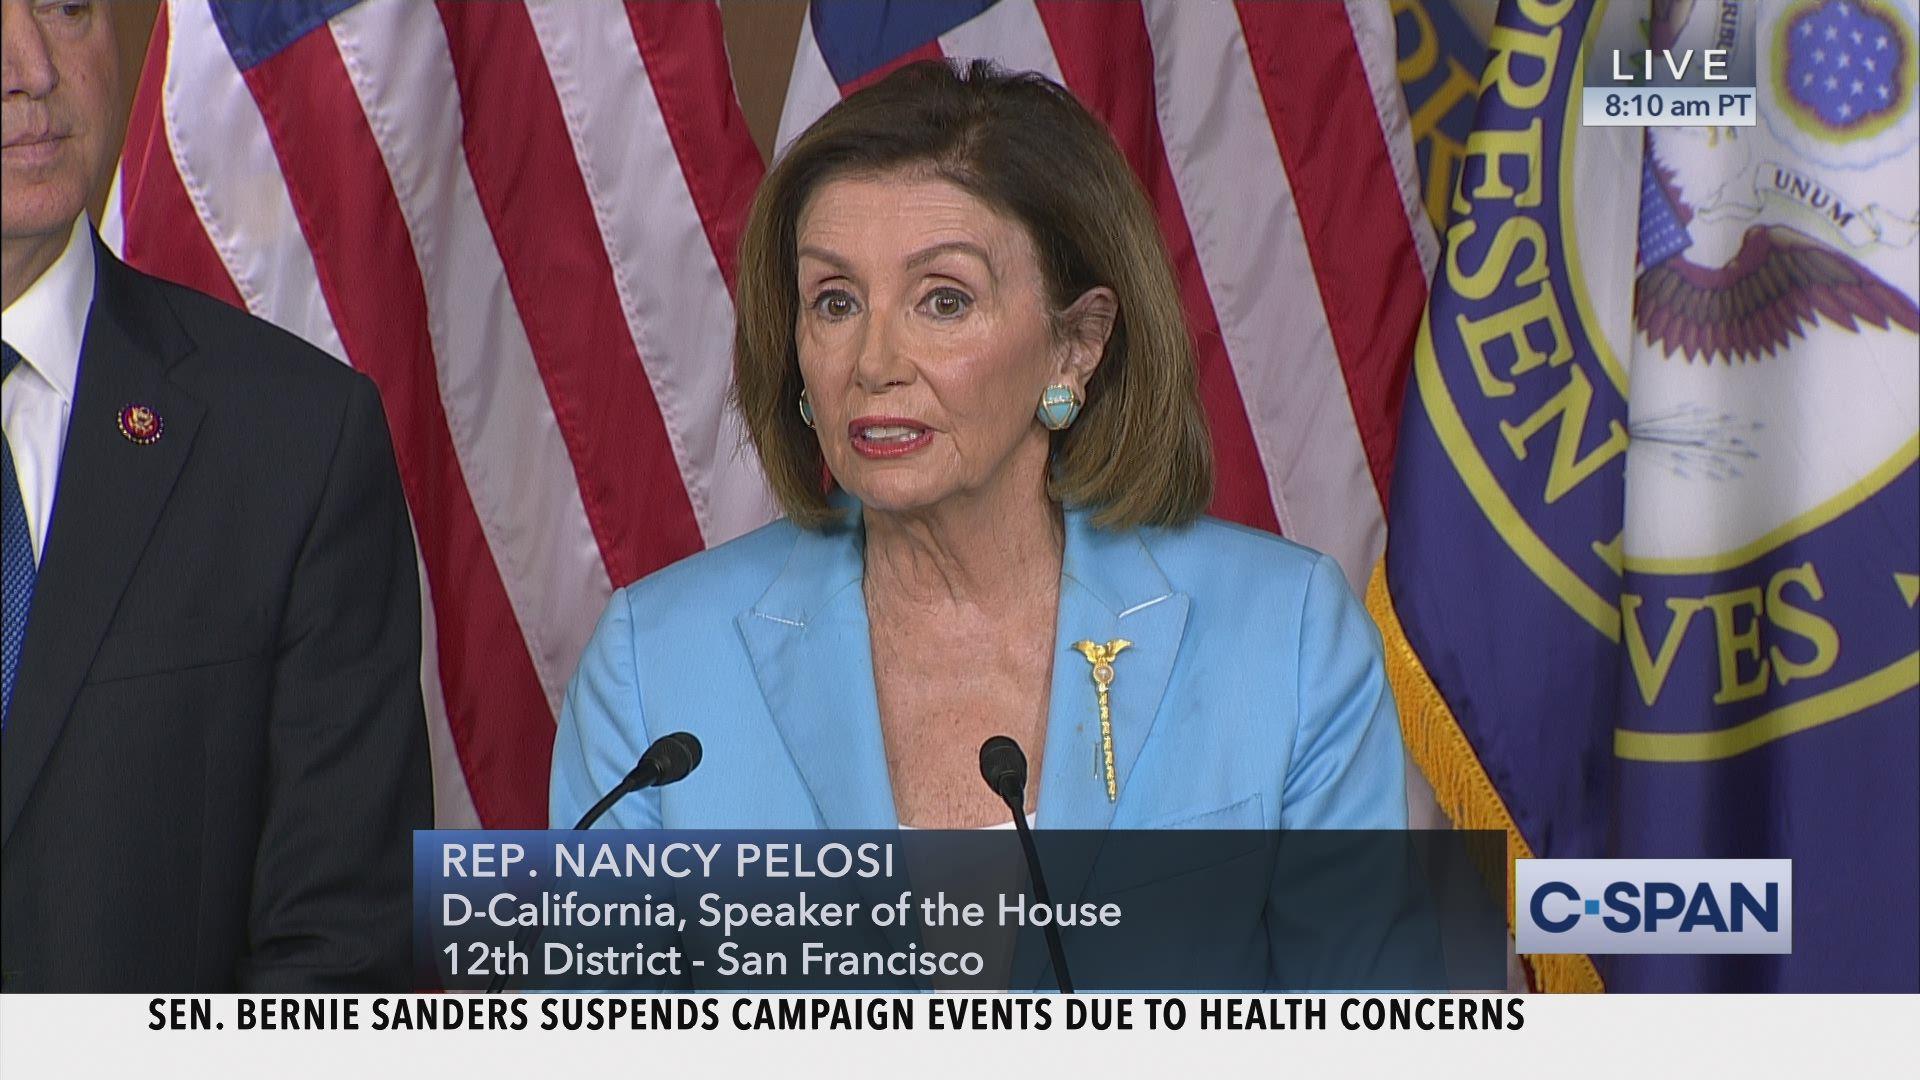 House Speaker Nancy Pelosi News Conference C Span Org